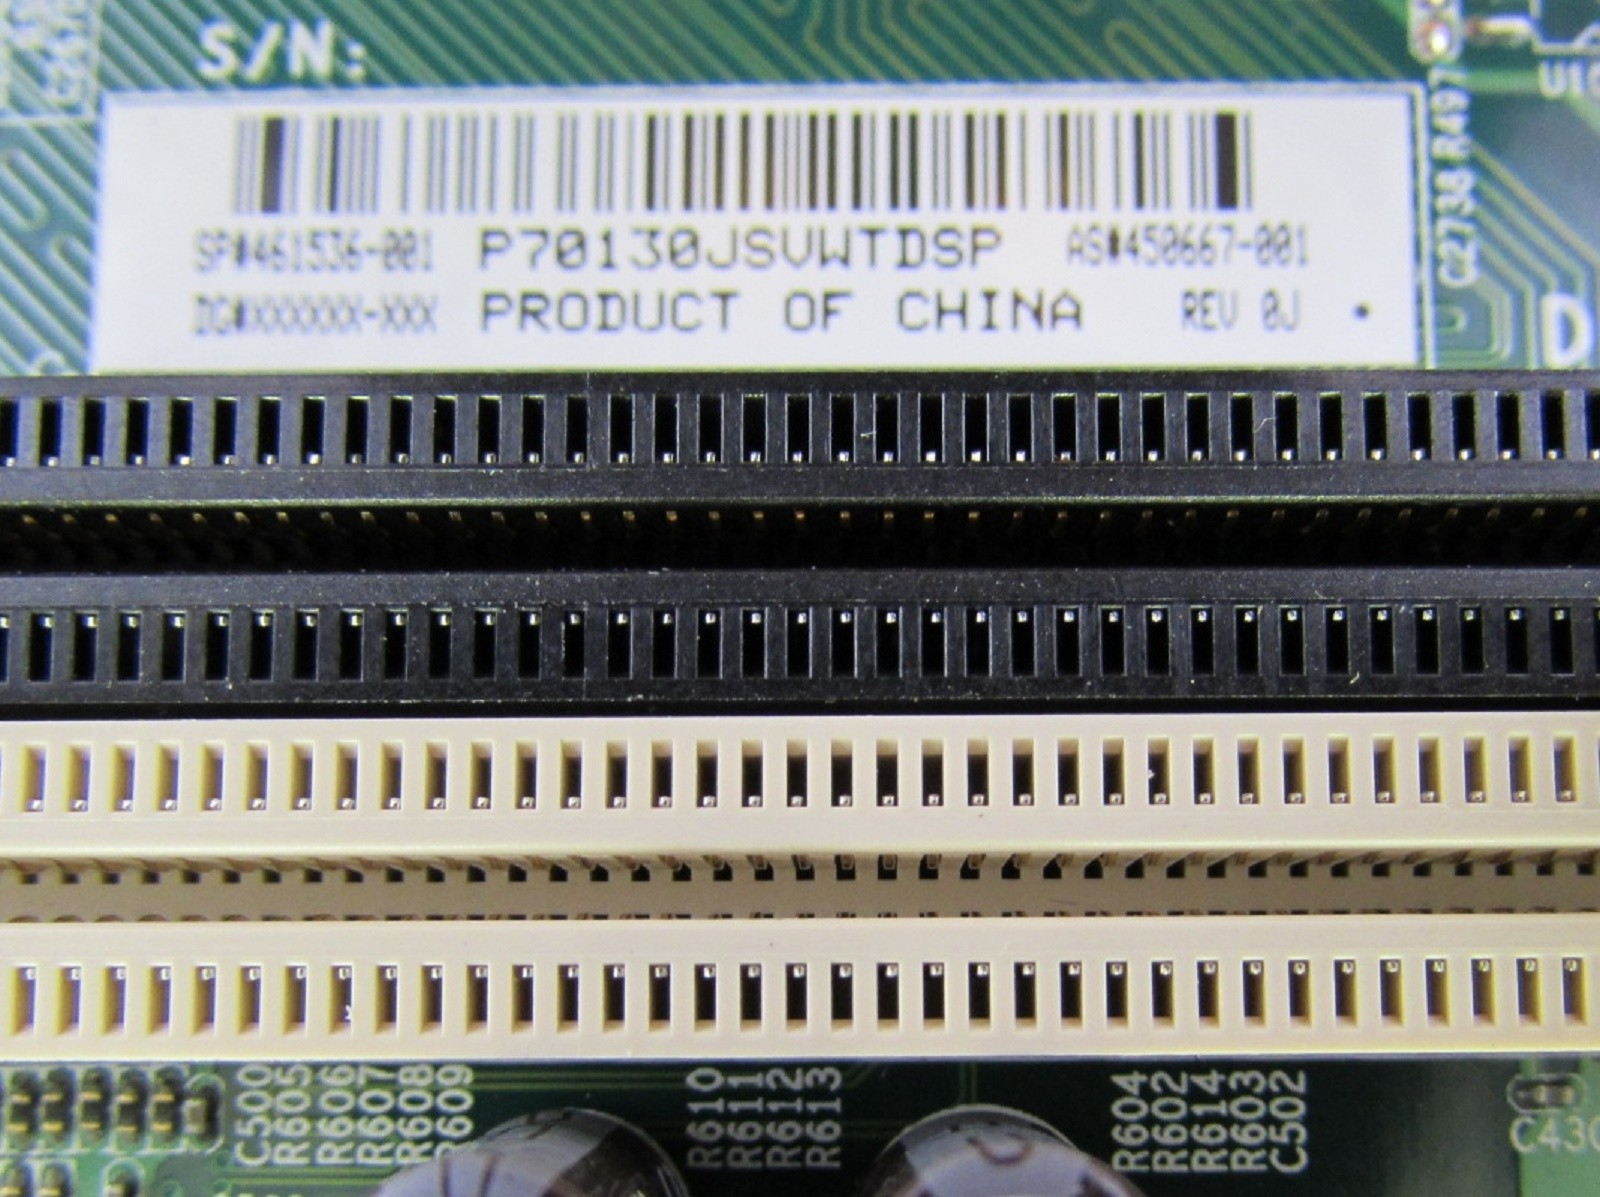 Hp dc5800 pci slots